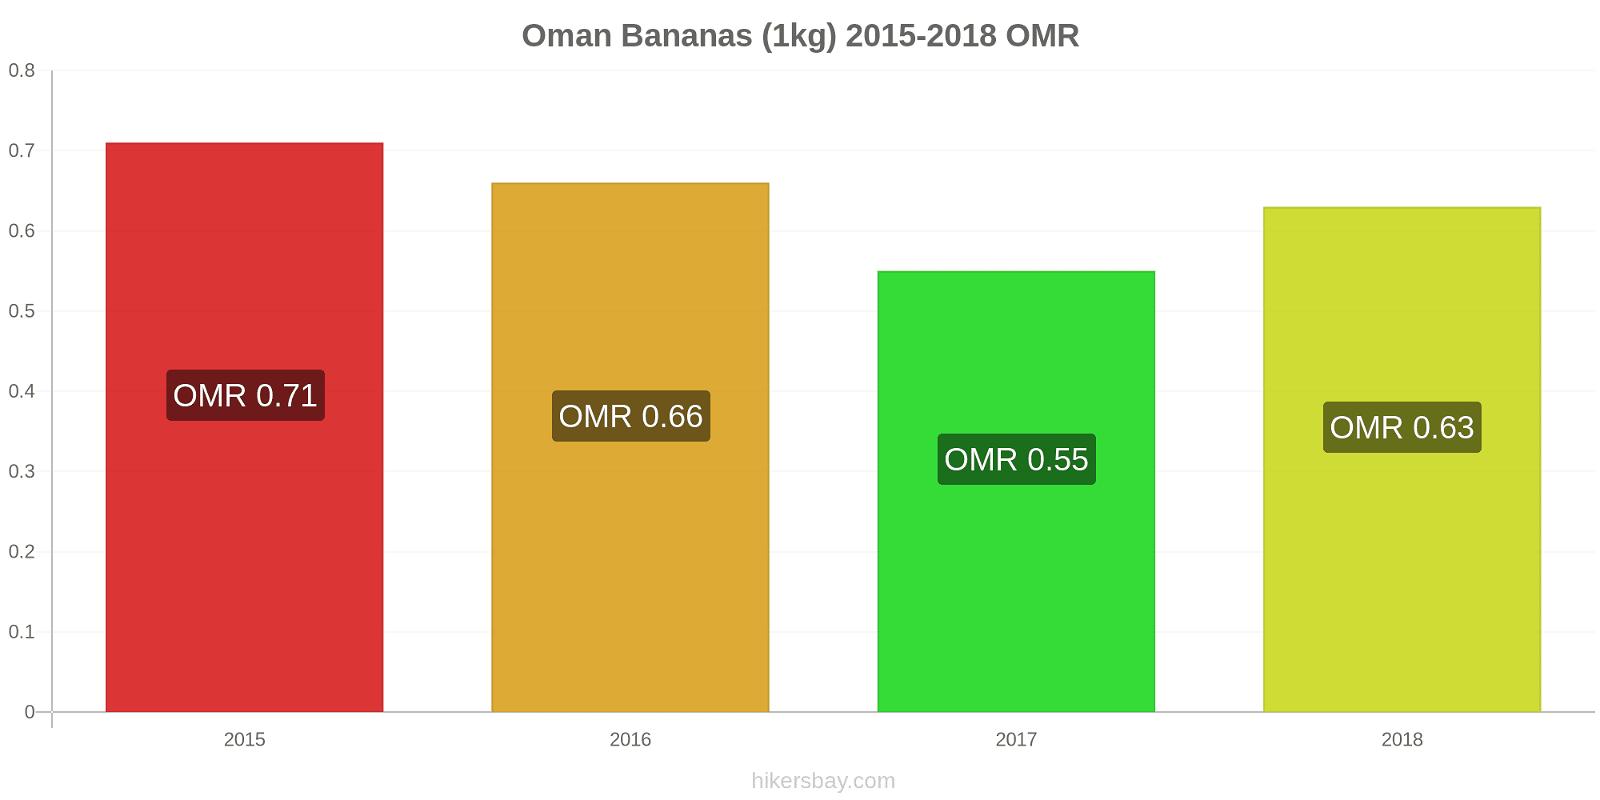 Oman price changes Bananas (1kg) hikersbay.com